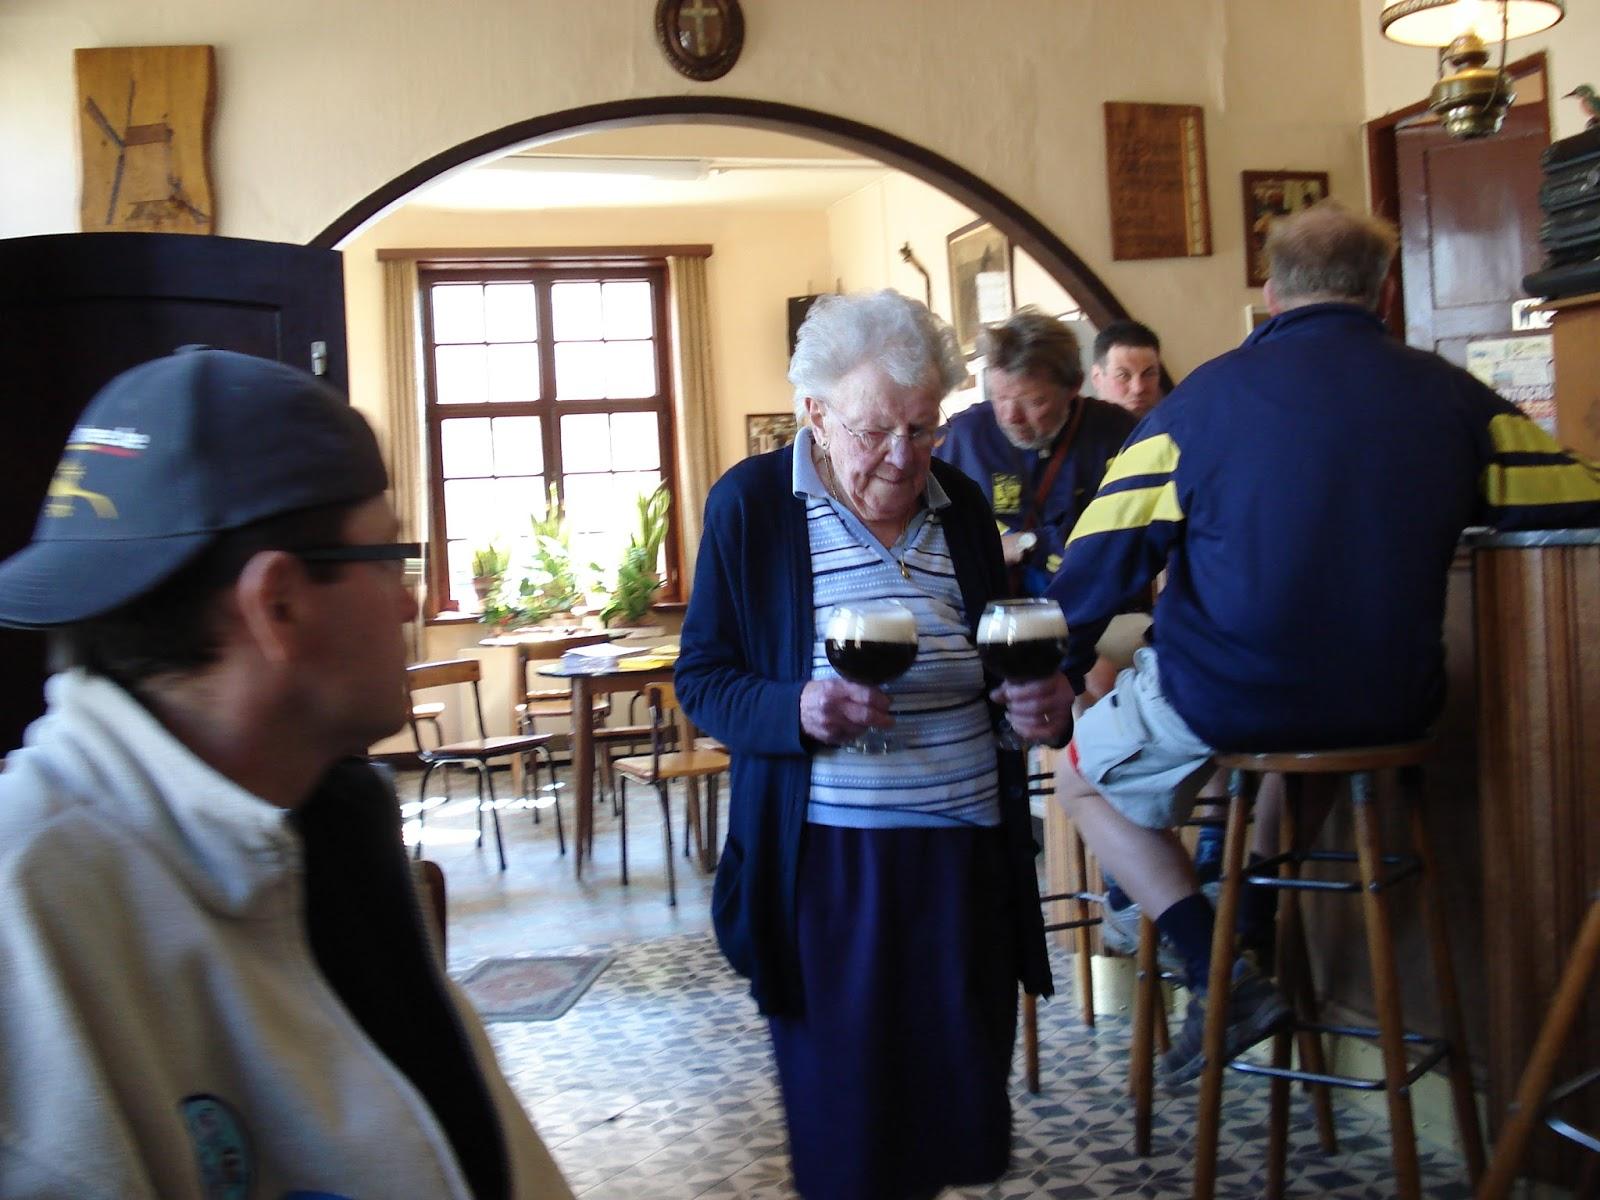 onderweg in het café de Vette Os in Leisele